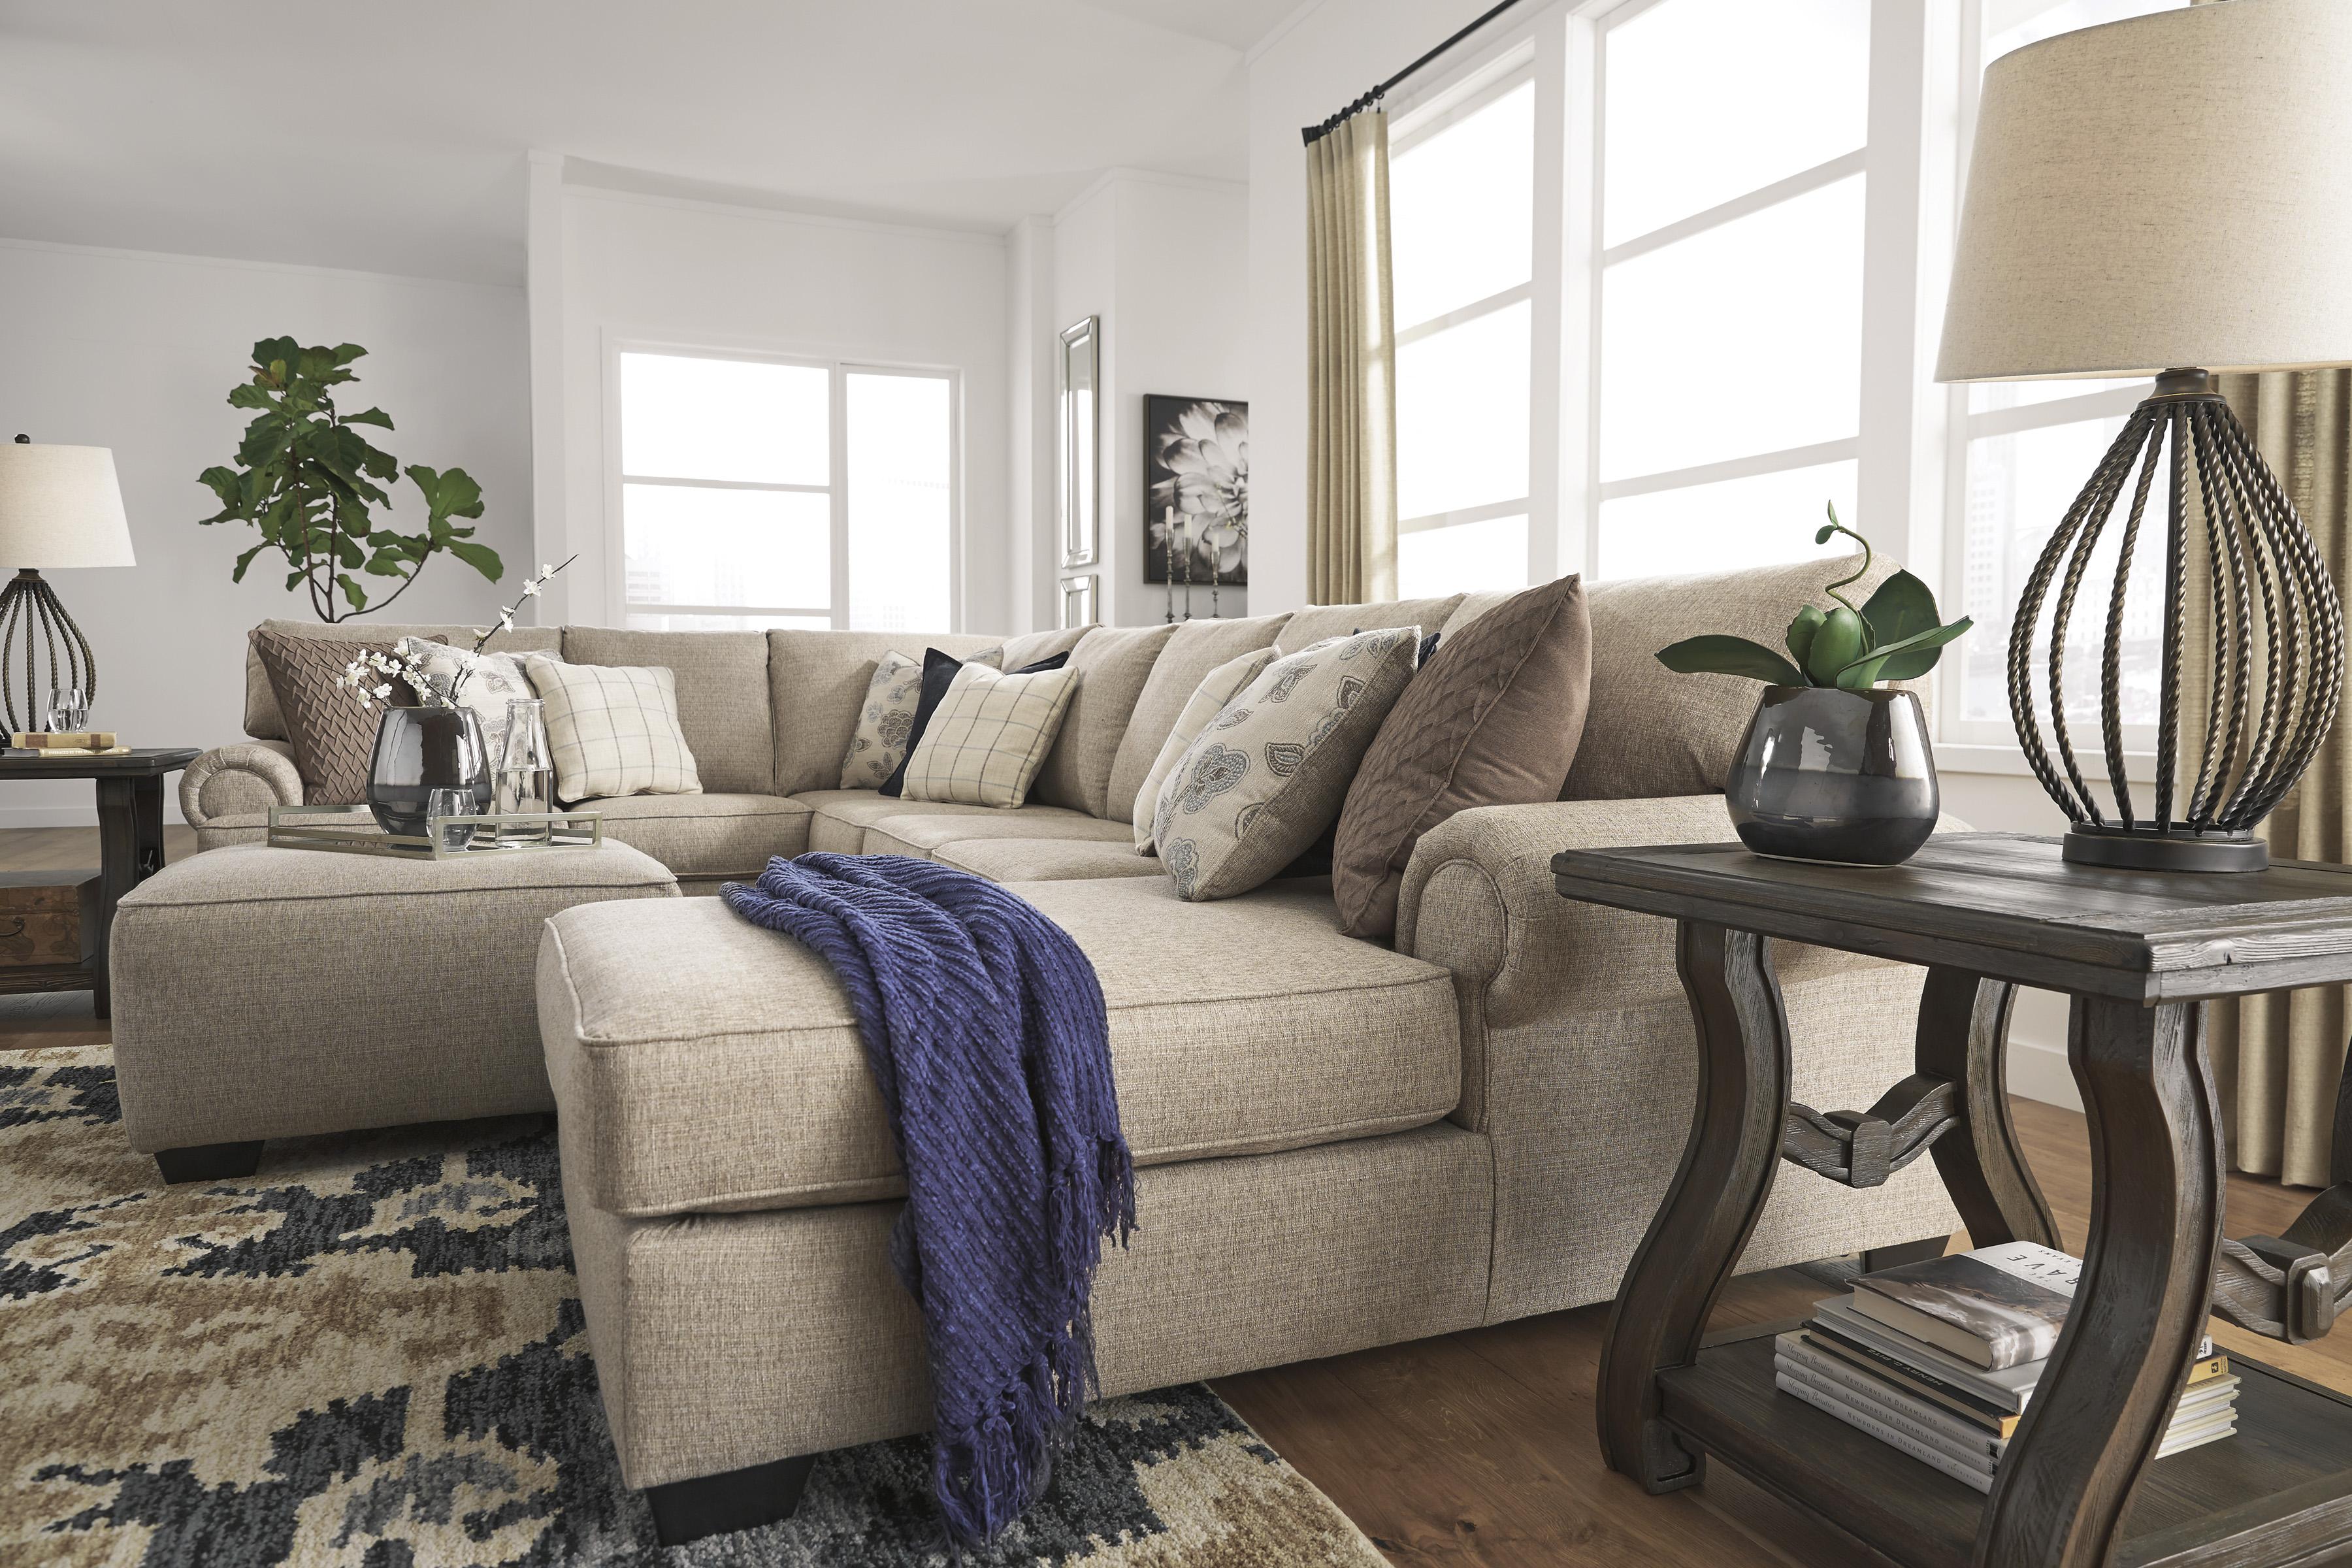 Ashley HomeStore - Quincy IL reviews   Home & Garden at 4303 ... on ashley recliners, ashley amazon, ashley sofa, ashley warehouse, ashley furniture, ashley sectional,